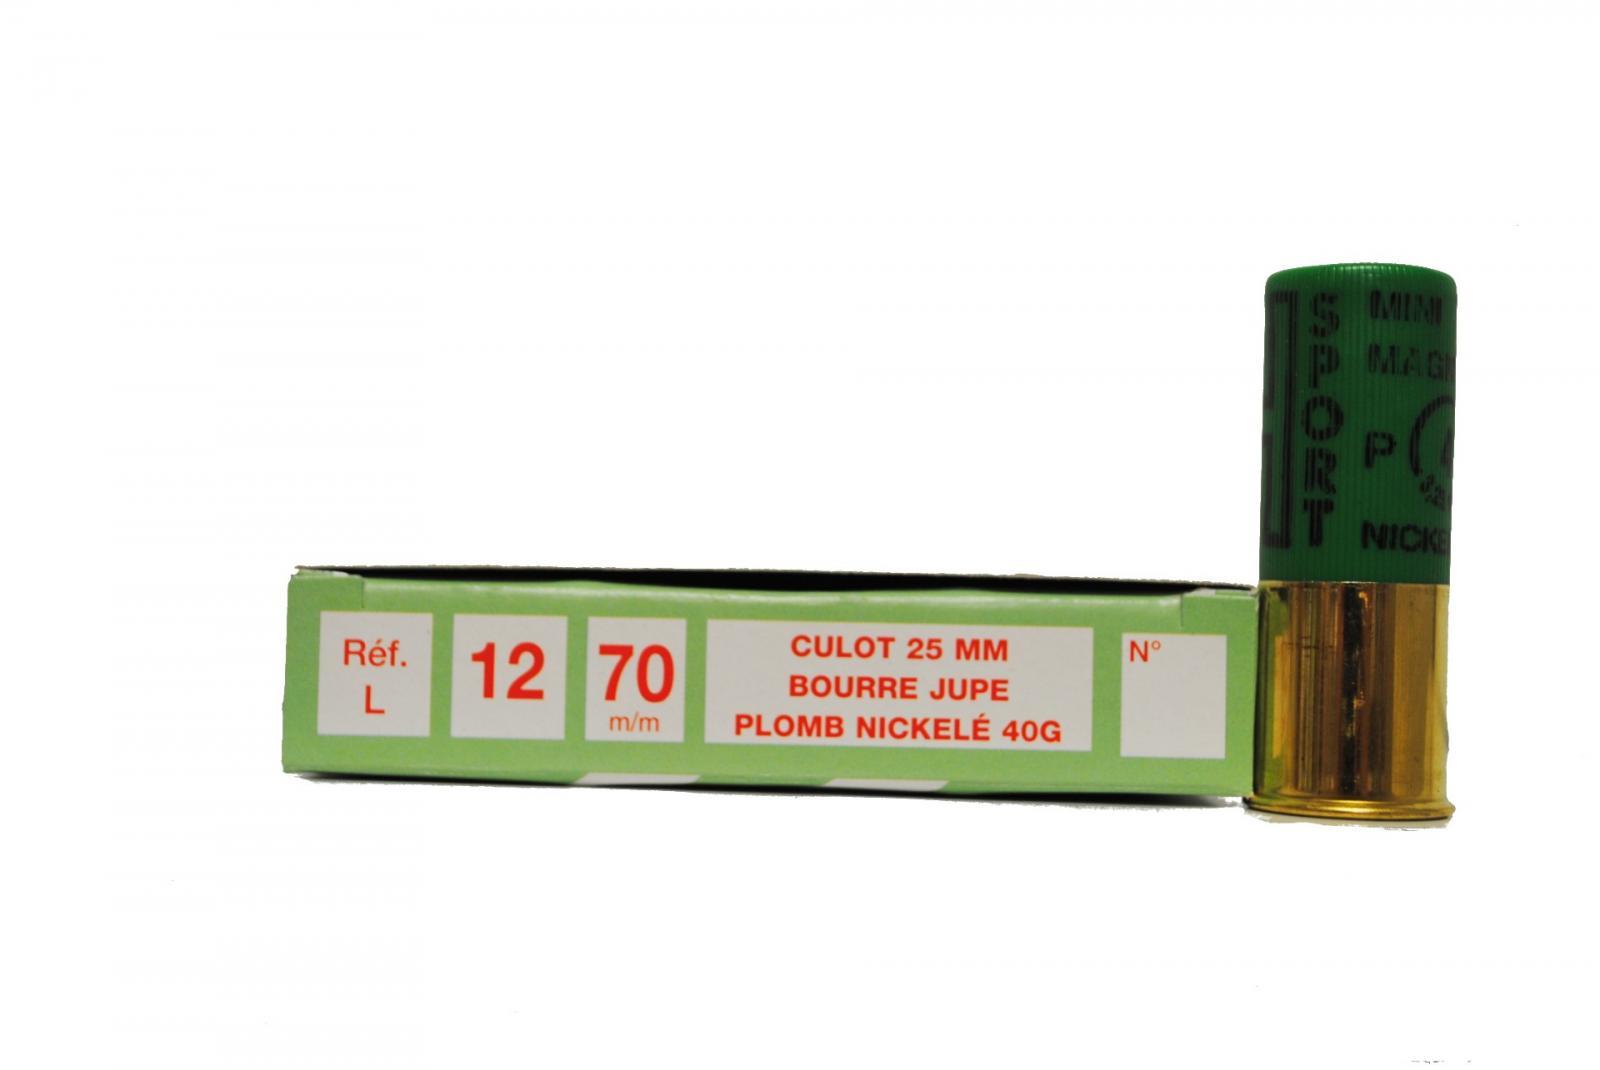 Boite de 10 cartouches 12 / 70 grand culot MINI MAGNUM 40 grs L1